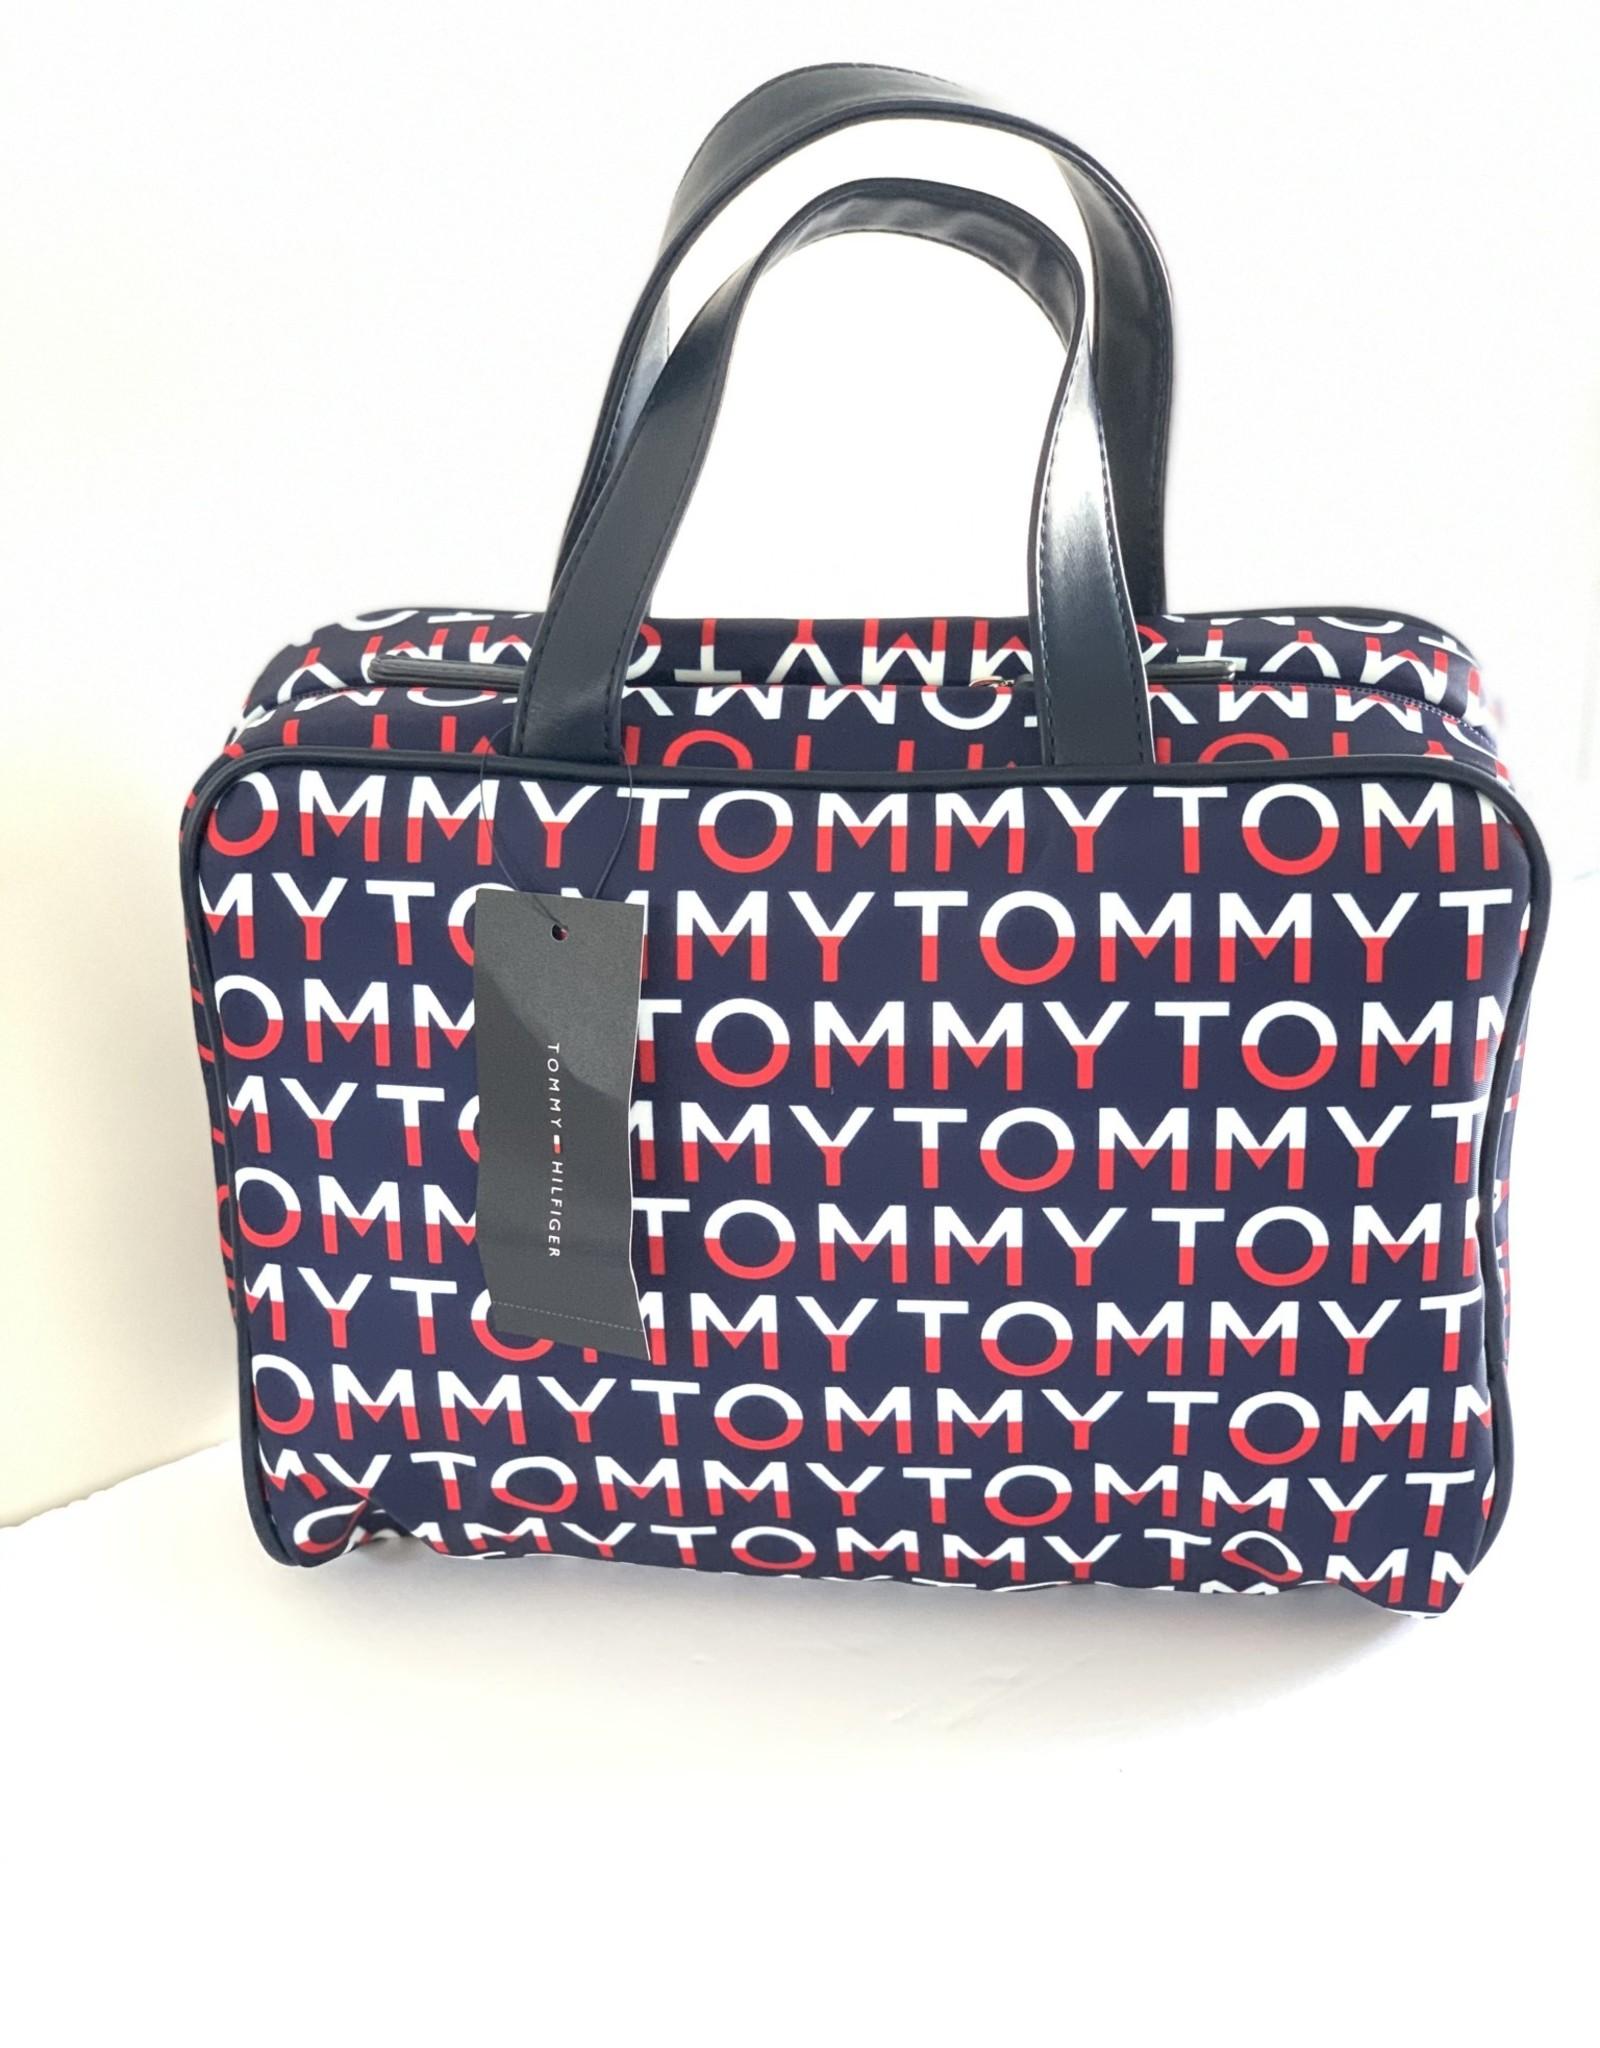 Tommy Hilfiger Tommy Hilfiger Cosmetic Bag